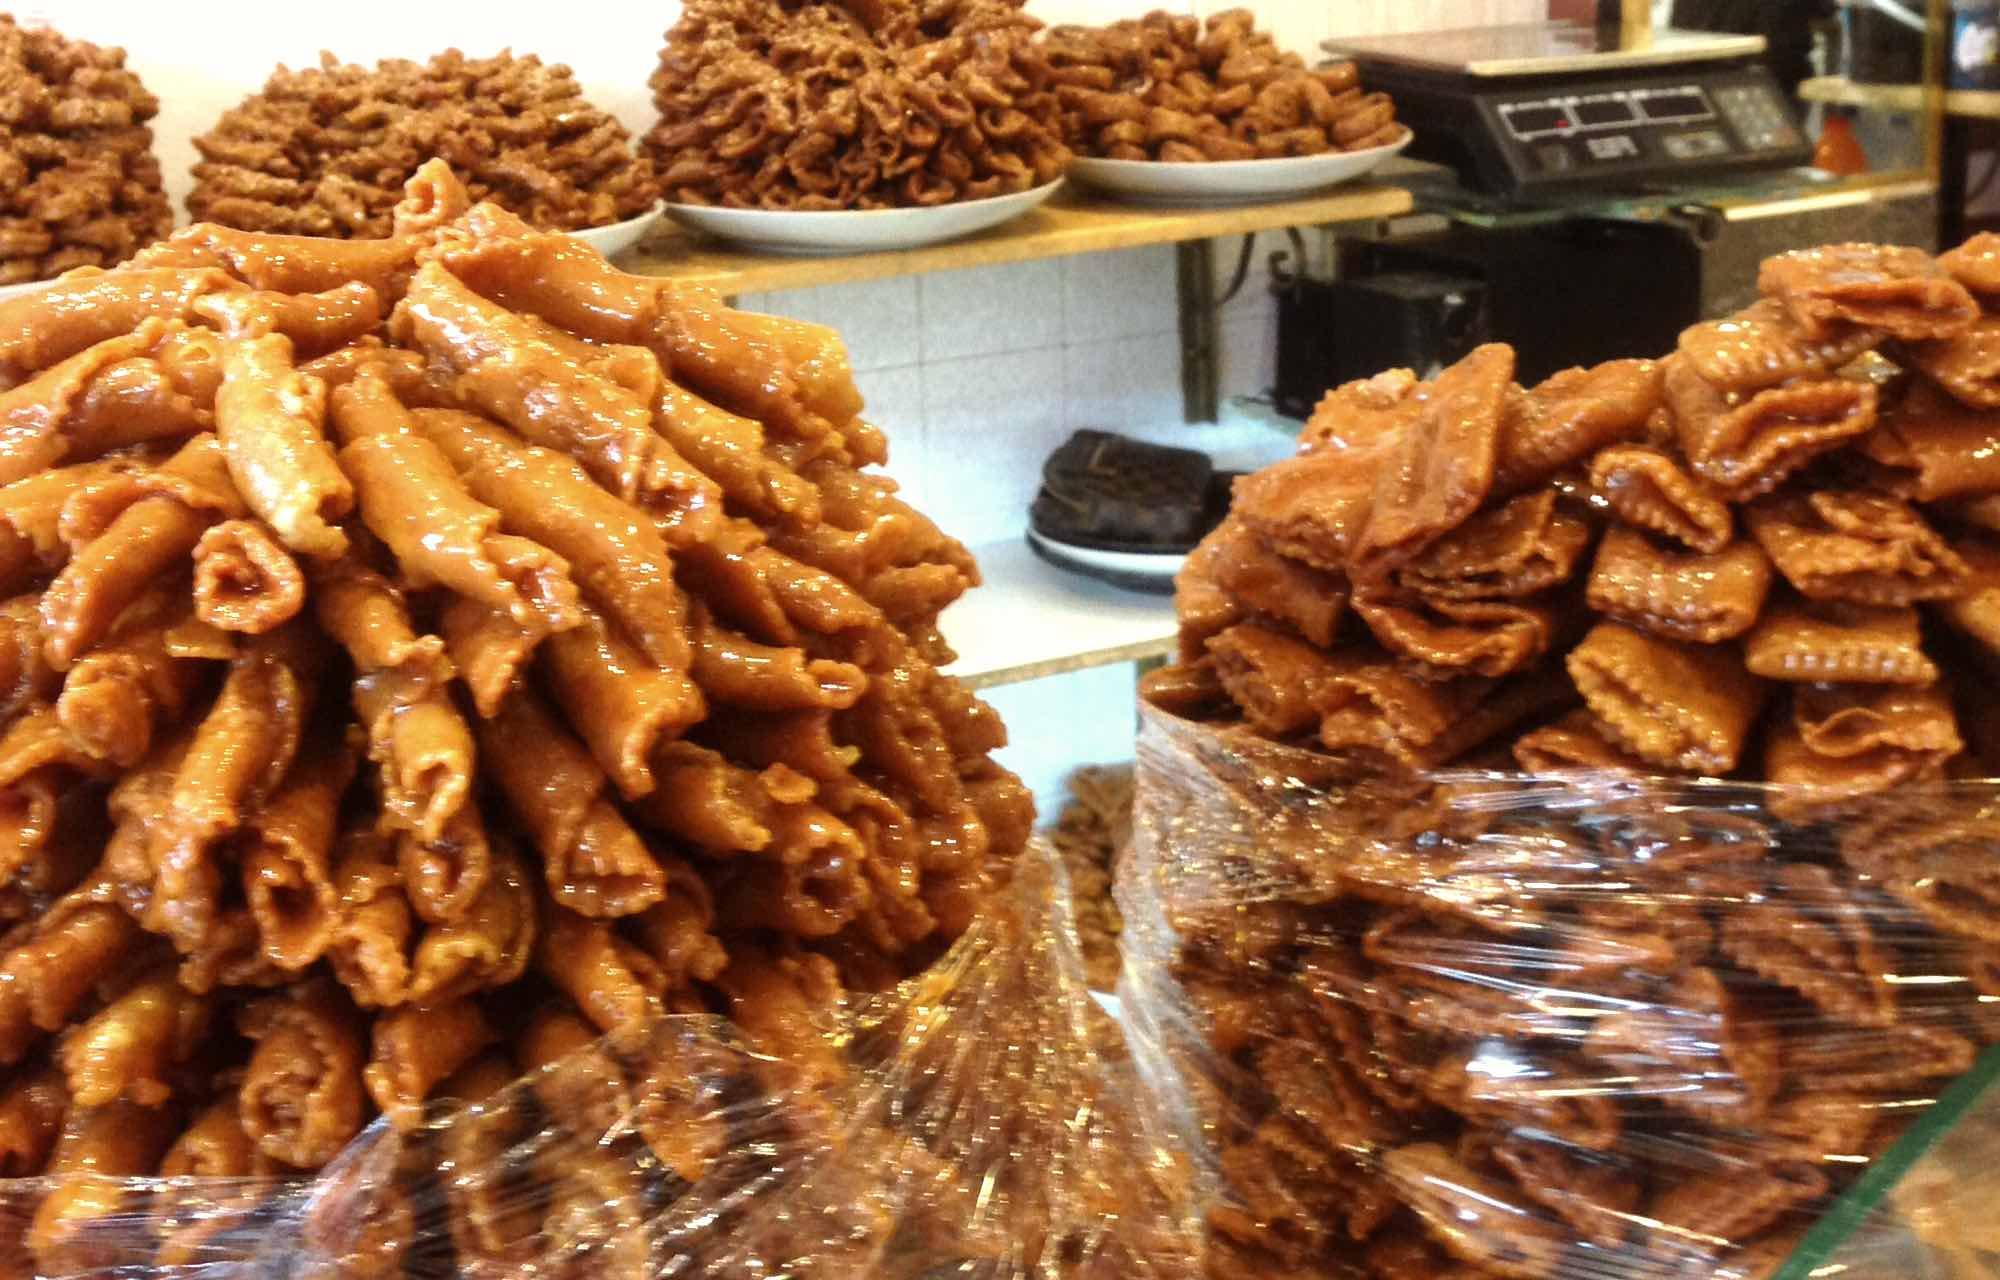 Marrokanische Süßigkeiten